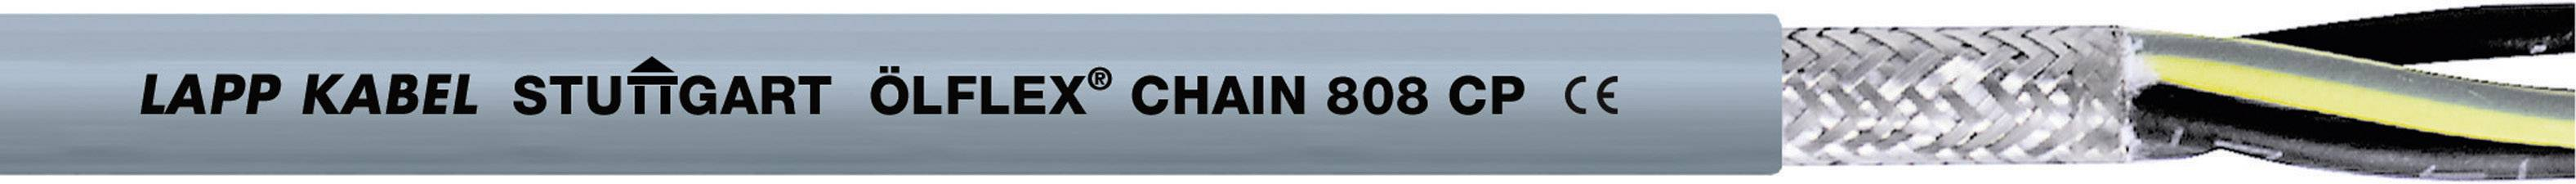 Žíla kabelu LappKabel ÖLFLEX CHAIN 808 CP 2X0,5 (1027751), 2x 0,5 mm², polyurethan, Ø 5,8 mm, stíněný, 50 m, š